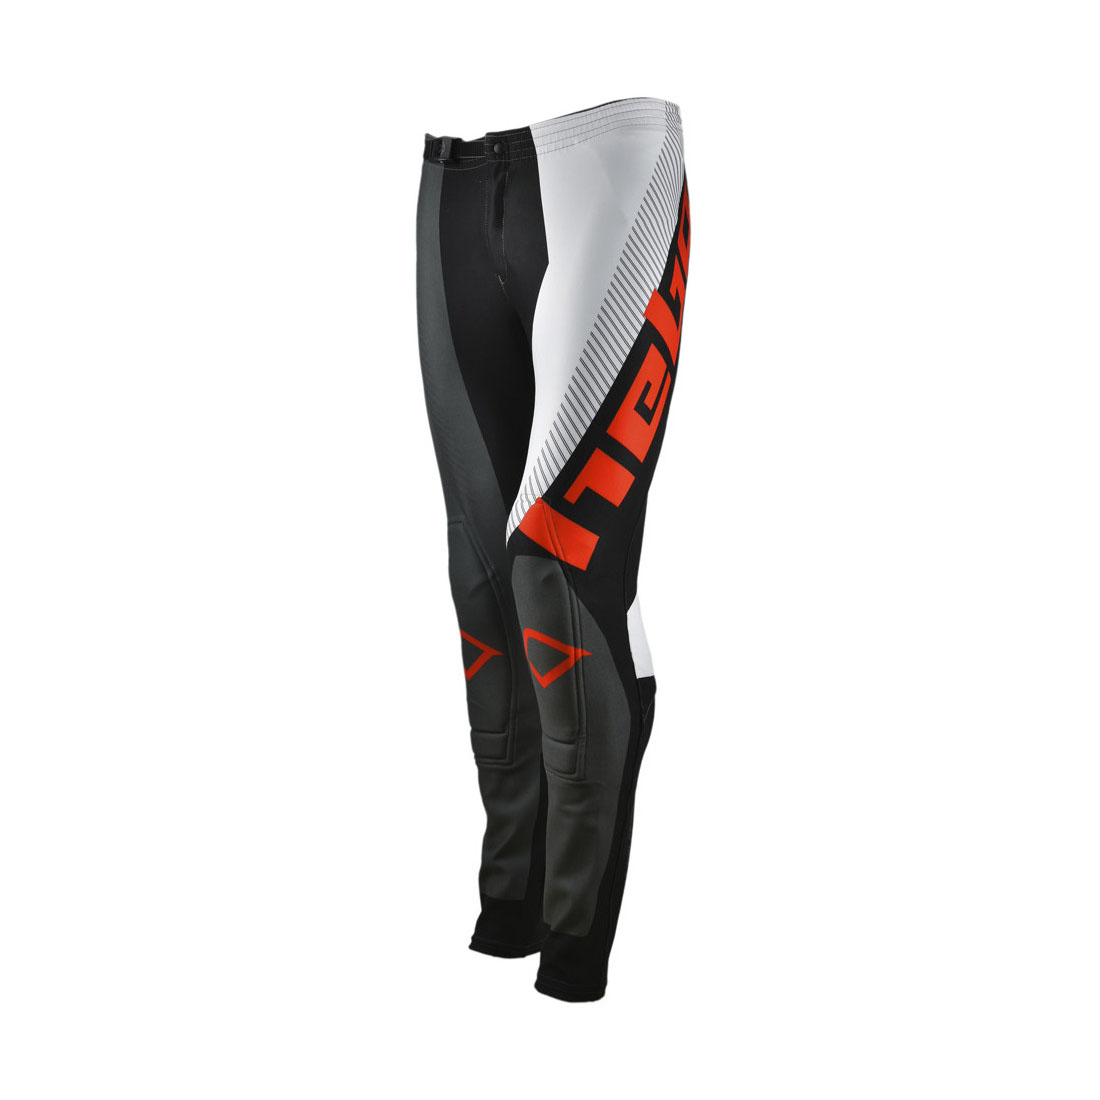 Hebo Pro 20 Trials Pants (Grey)